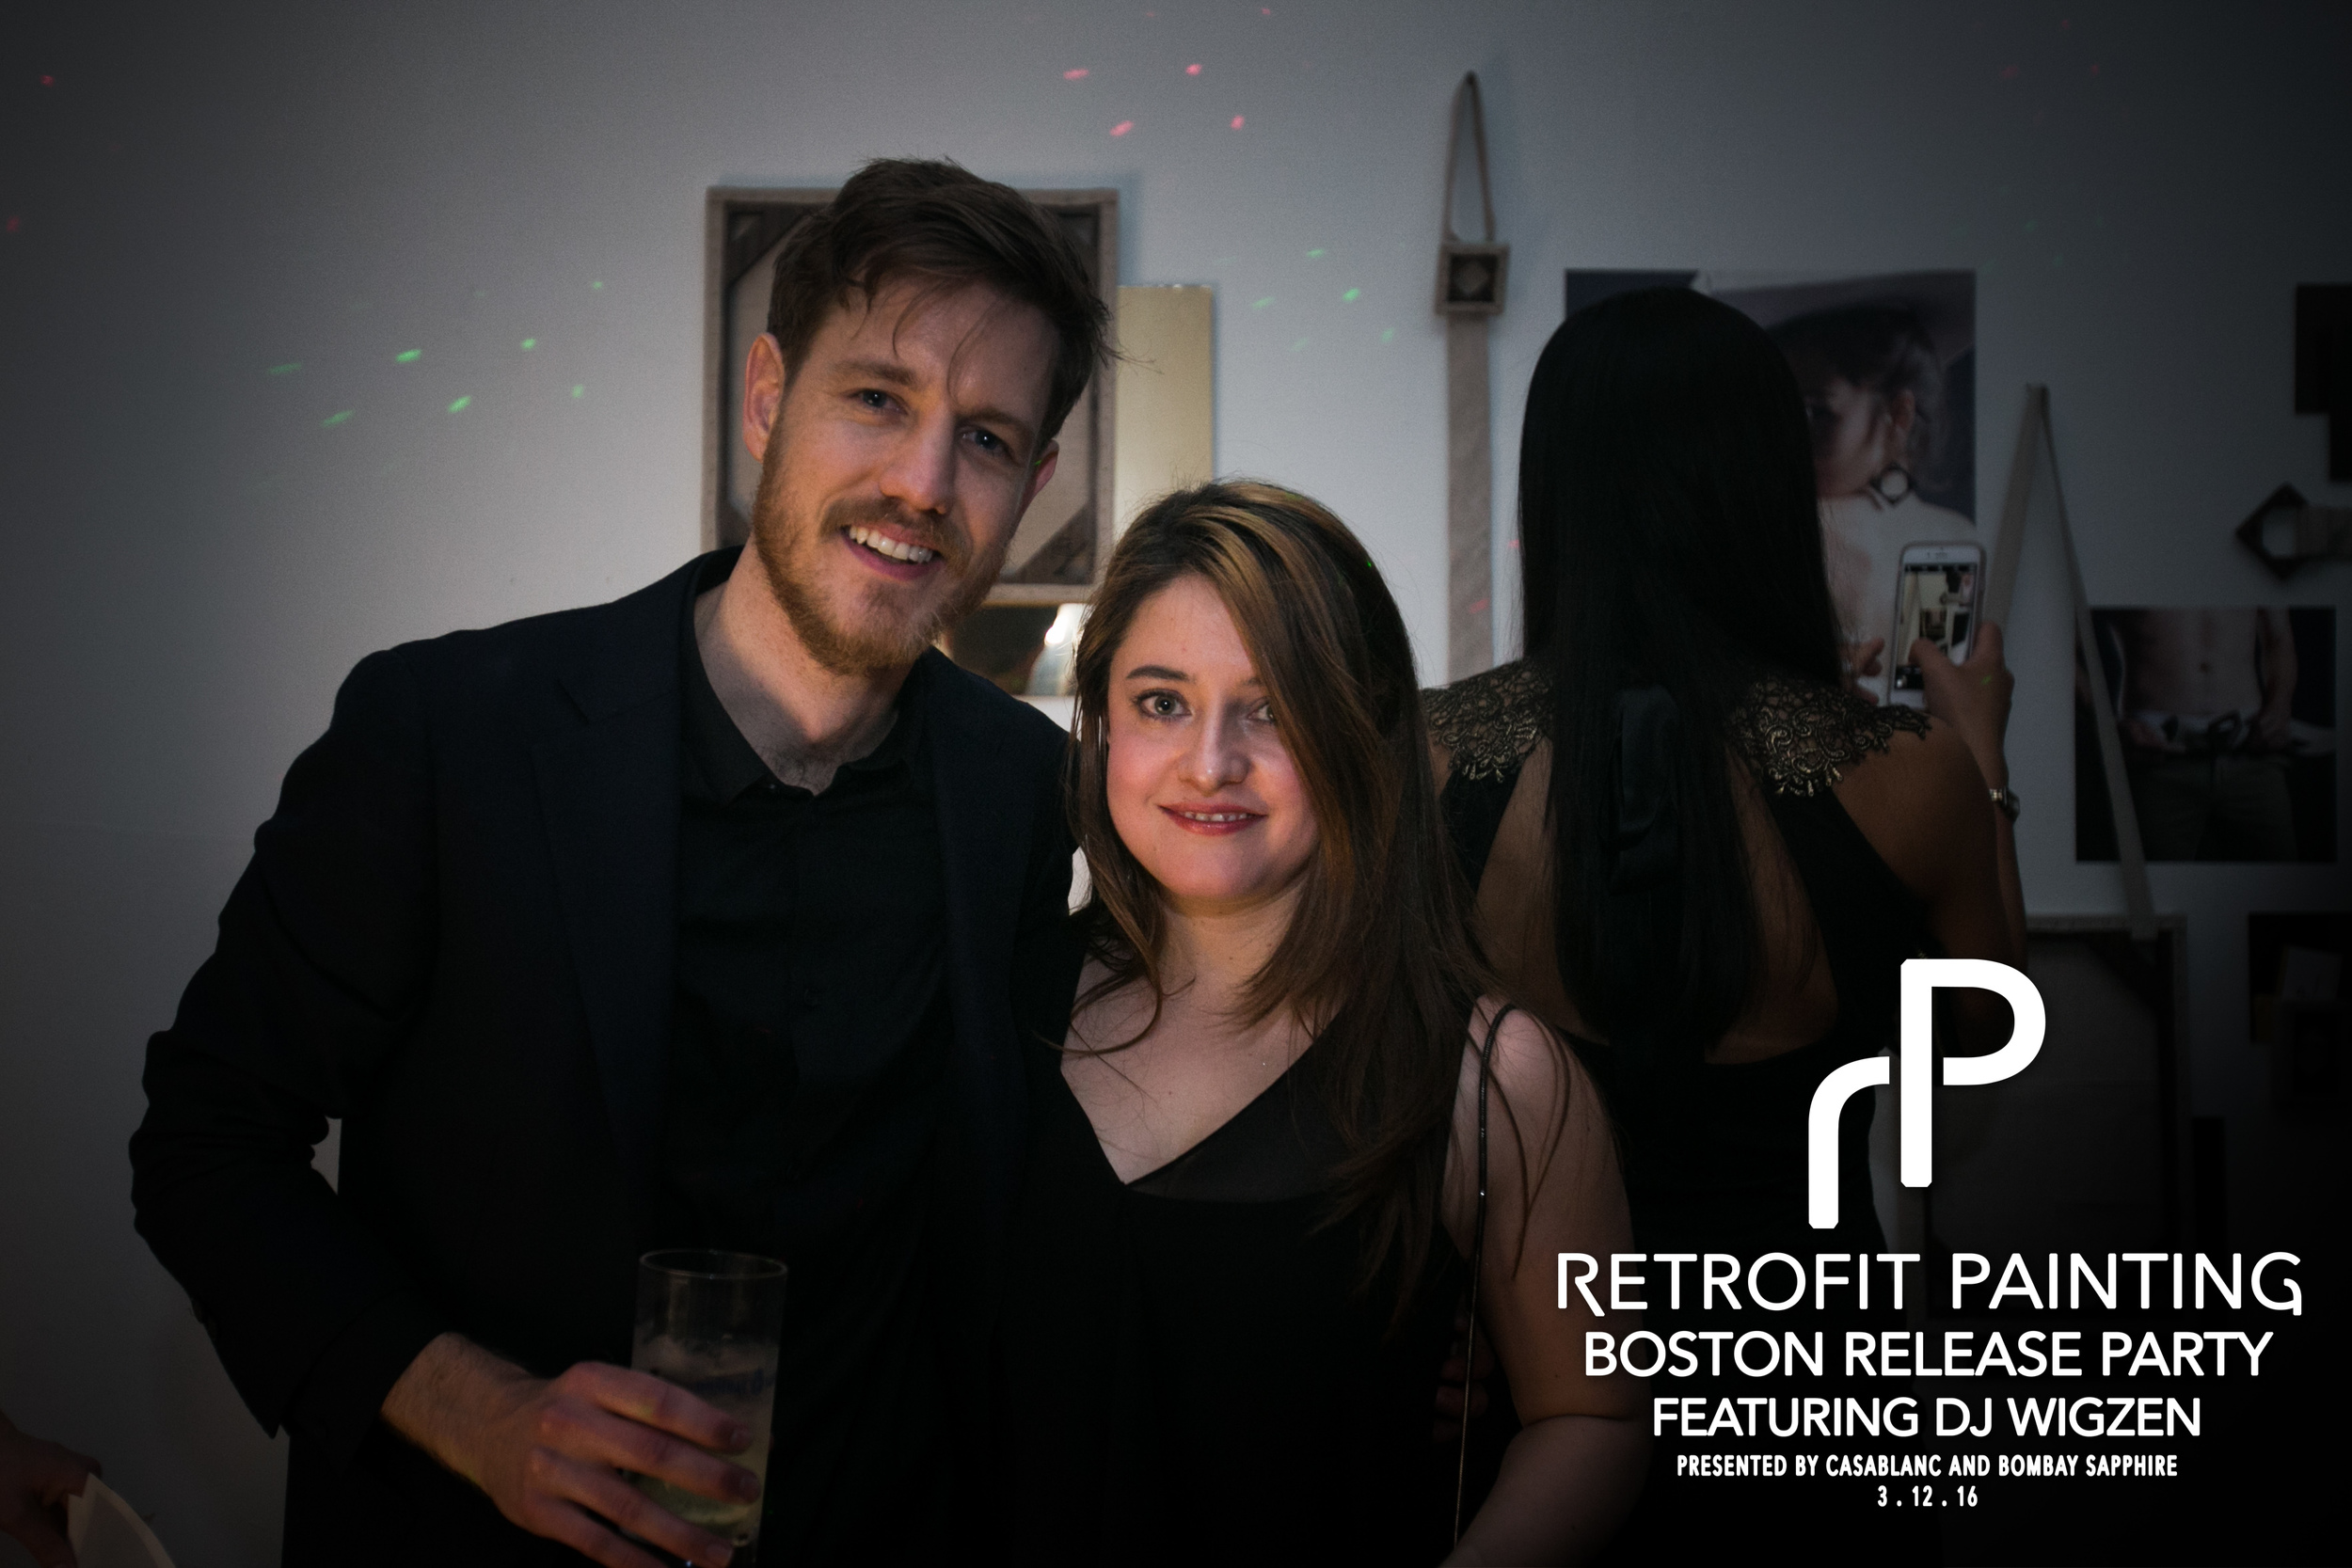 Retrofit Painting Boston Release Party 0212.jpg